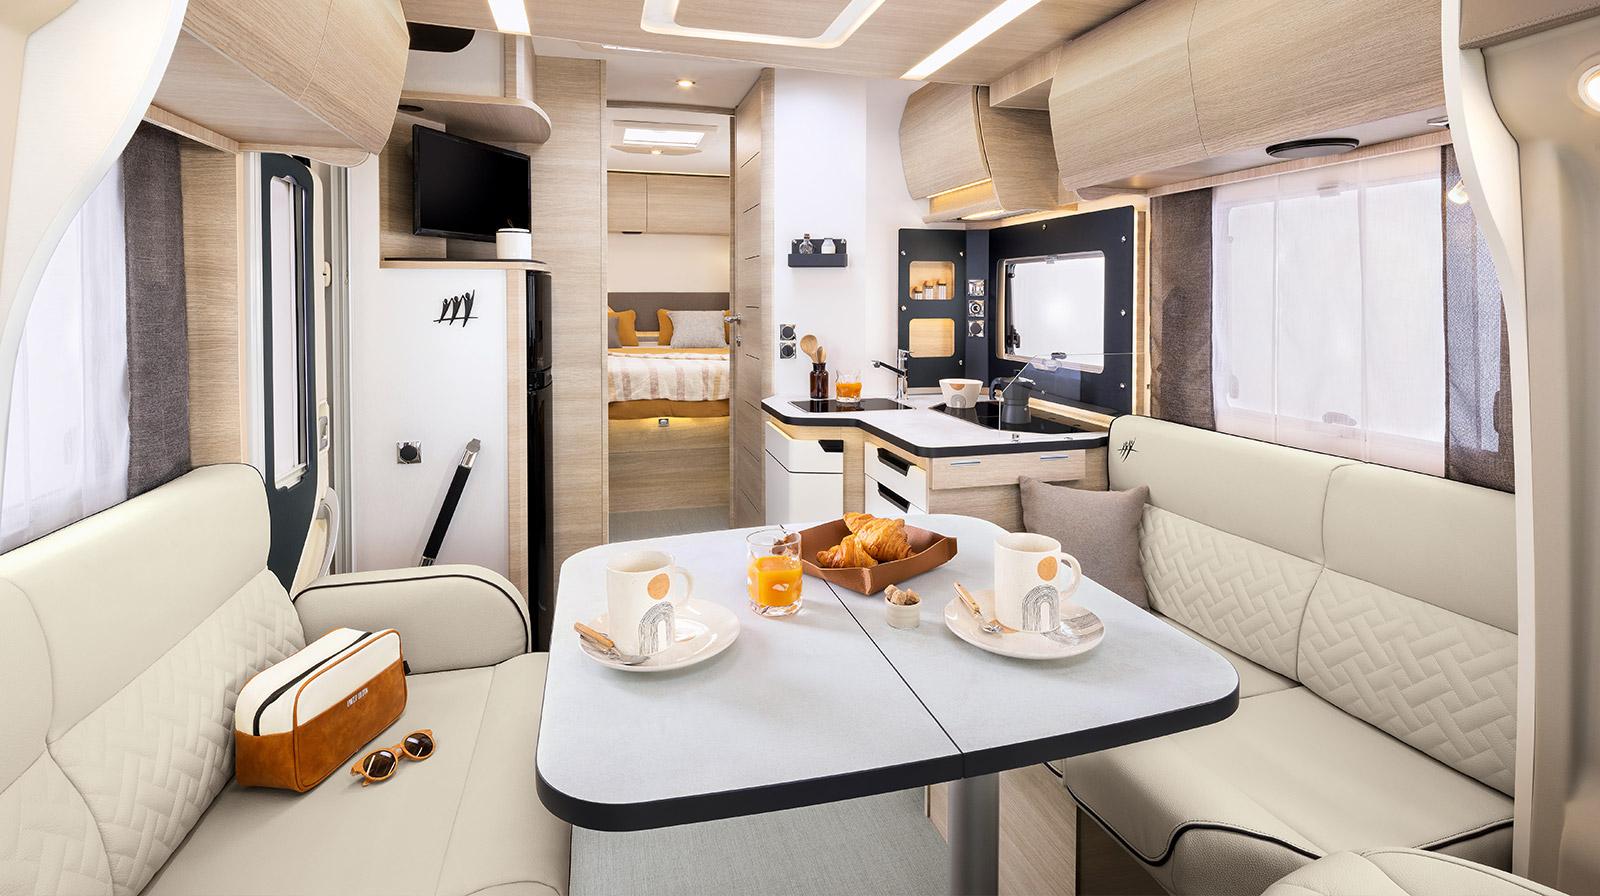 le mod le 696f est un camping car profil rapido de la s rie 6f. Black Bedroom Furniture Sets. Home Design Ideas